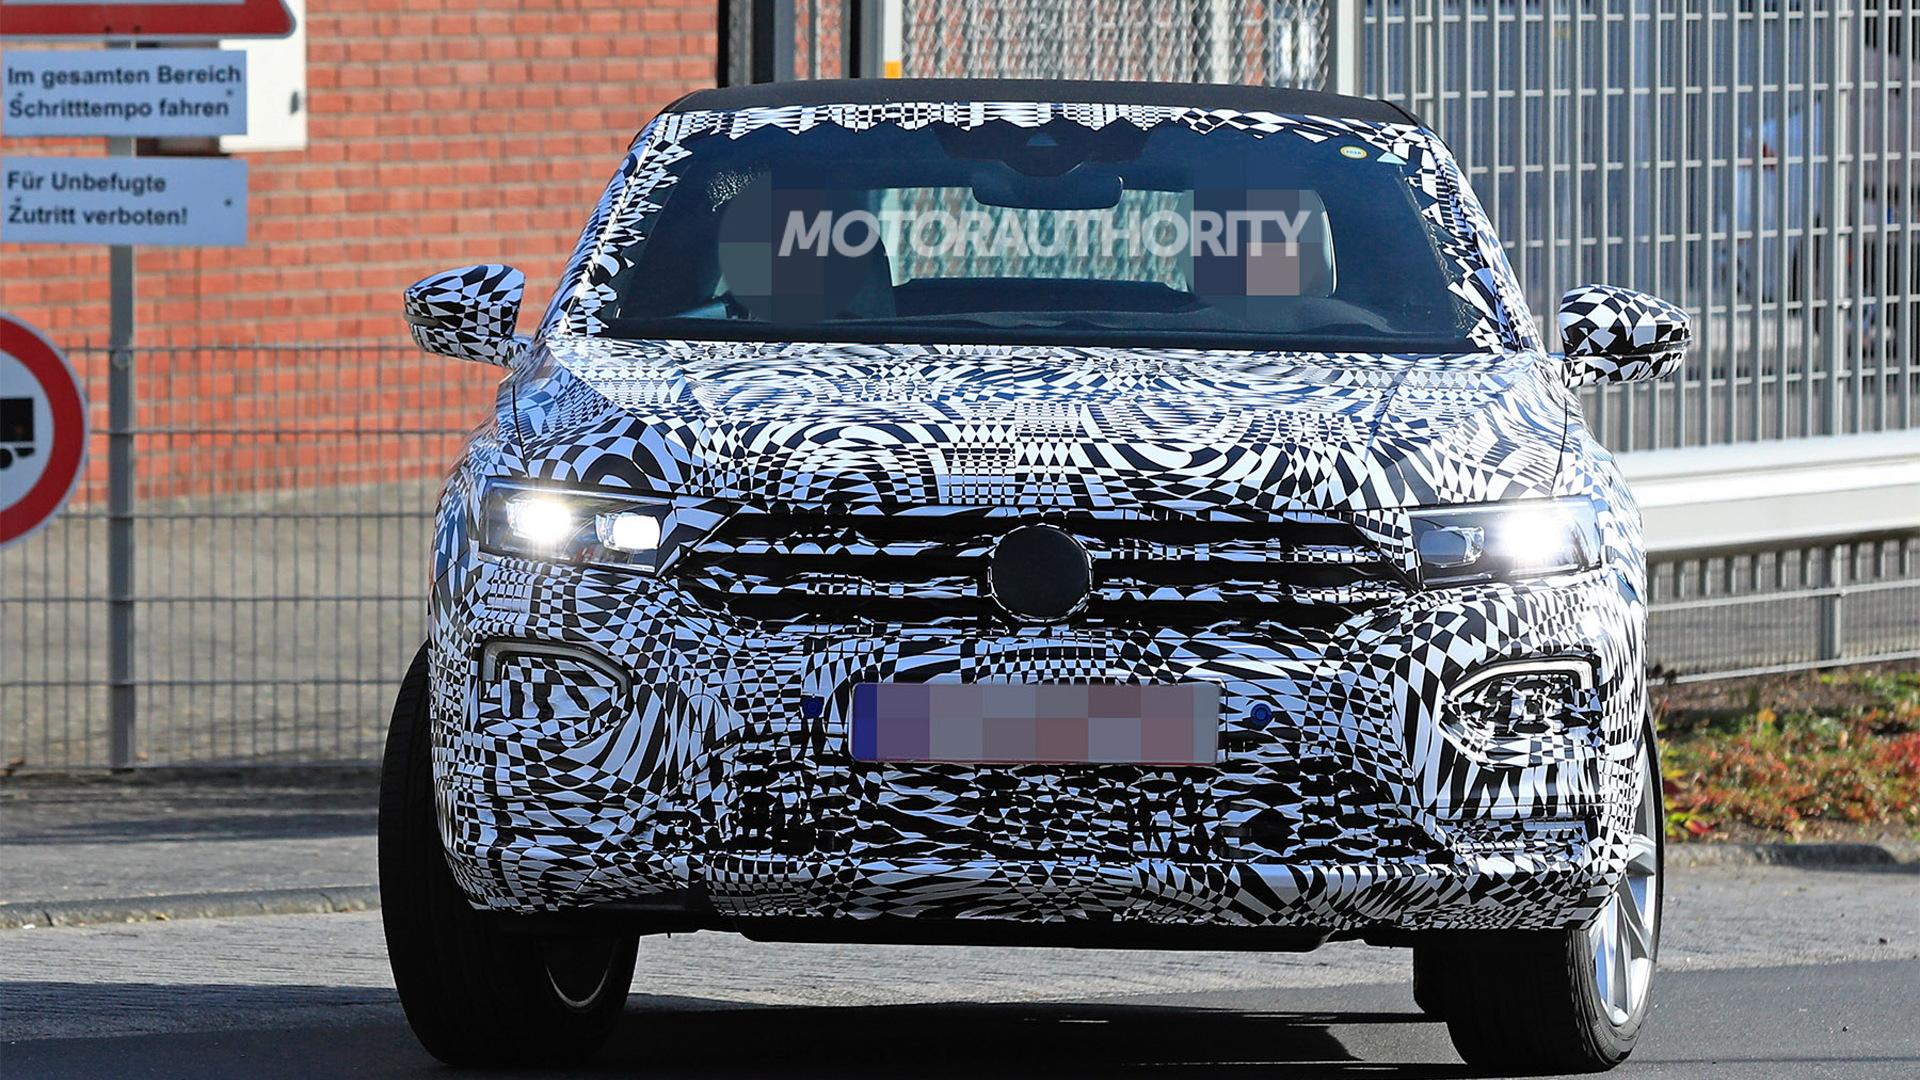 2020 Volkswagen T-Roc Cabriolet spy shots - Image via S. Baldauf/SB-Medien